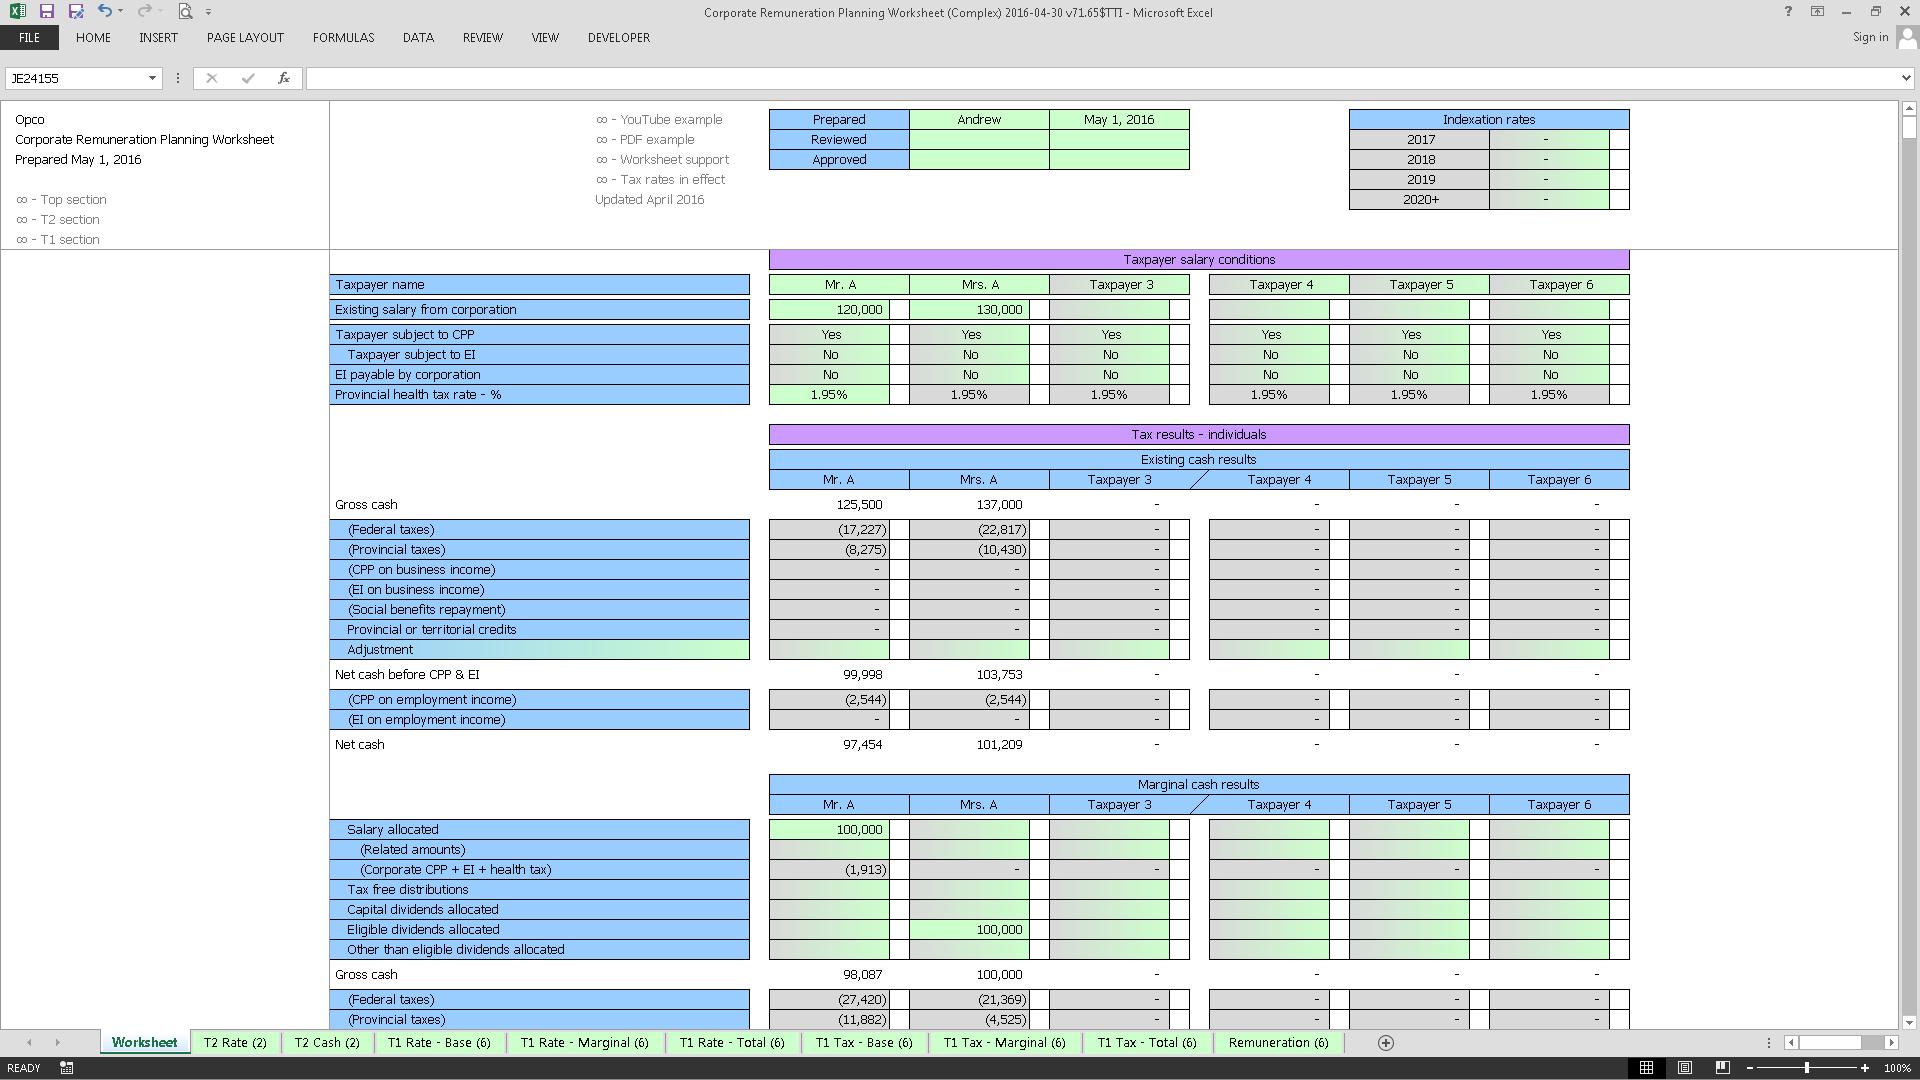 Corporate Remuneration Planning Worksheet (Complex) 2016-04-30 v71.65$TTI_Cover.png